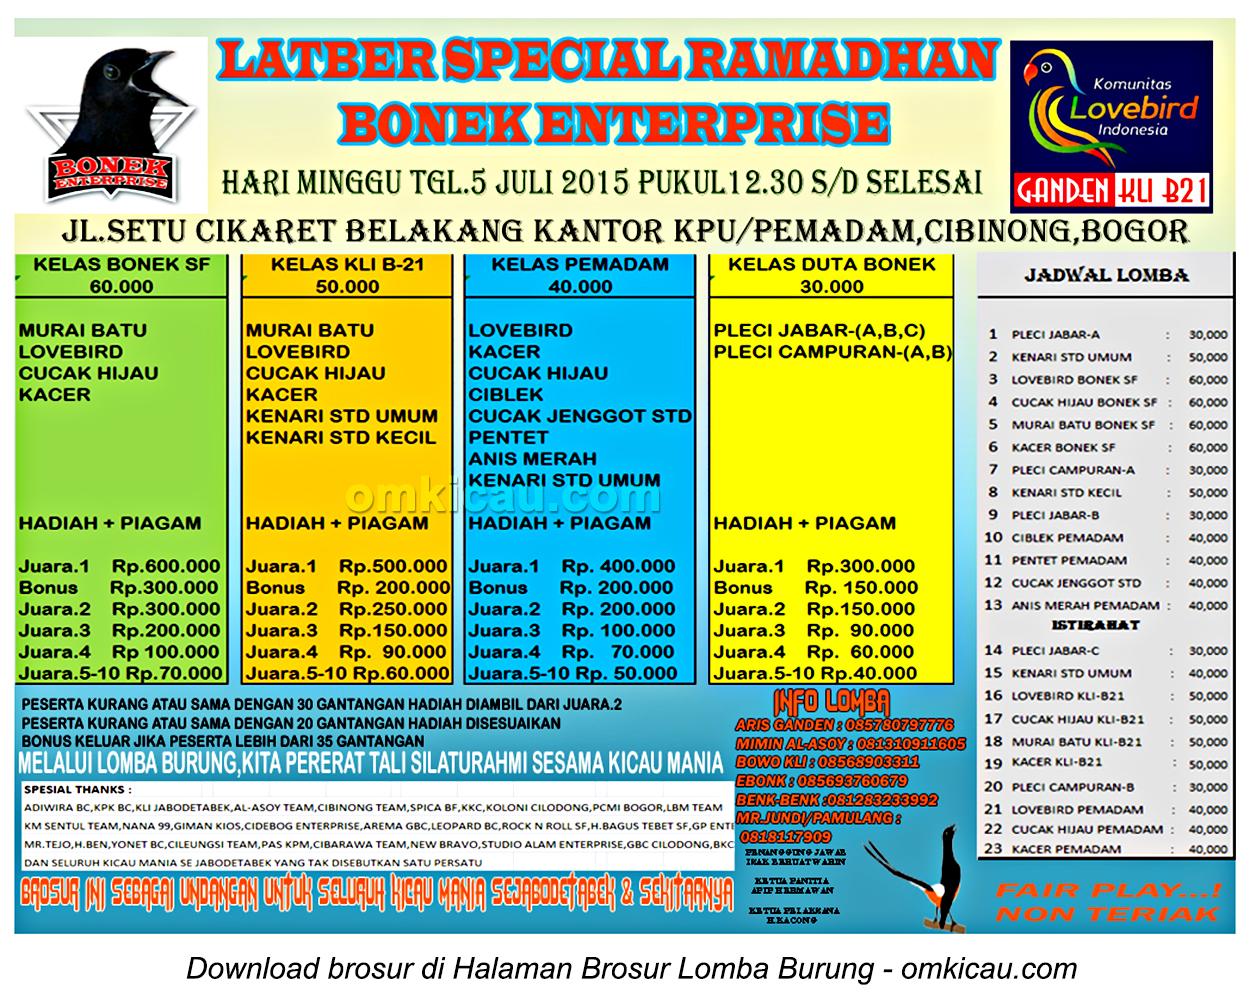 Brosur Latber Special Ramadhan Bonek Enterprise, Bogor, 5 Juli 2015